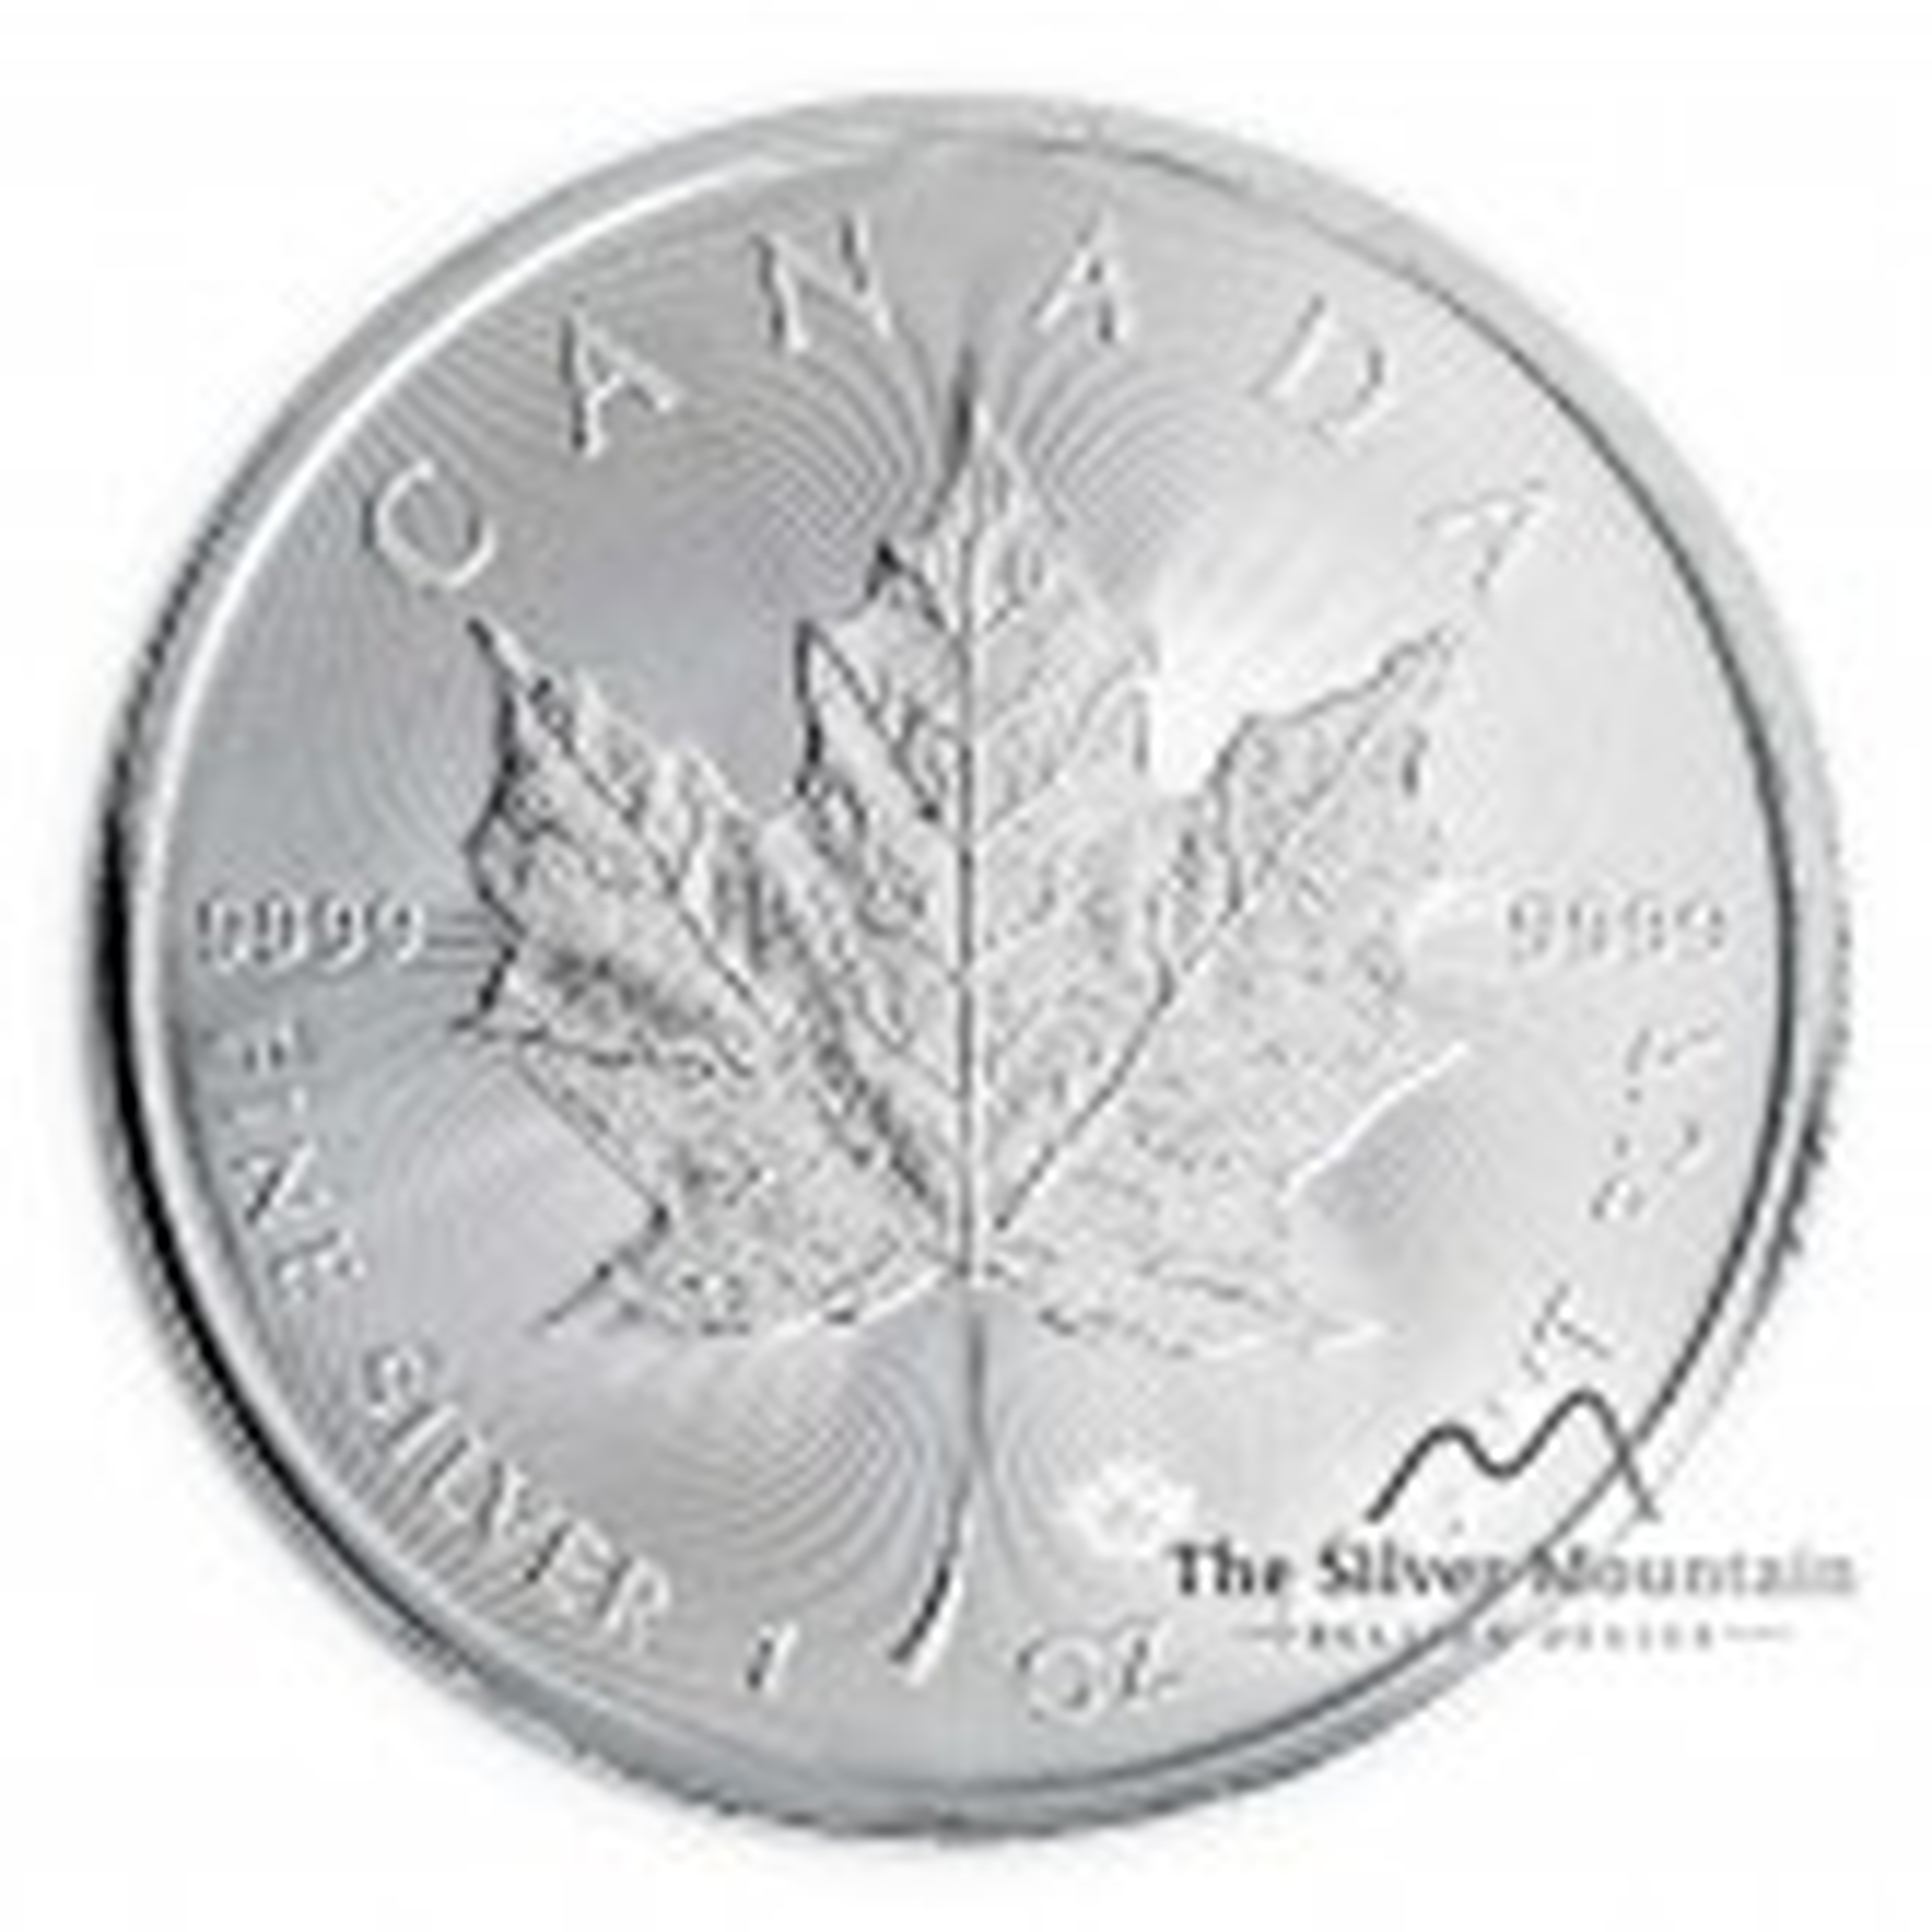 Nieuwe zilveren Maple Leaf munt 2020/2021